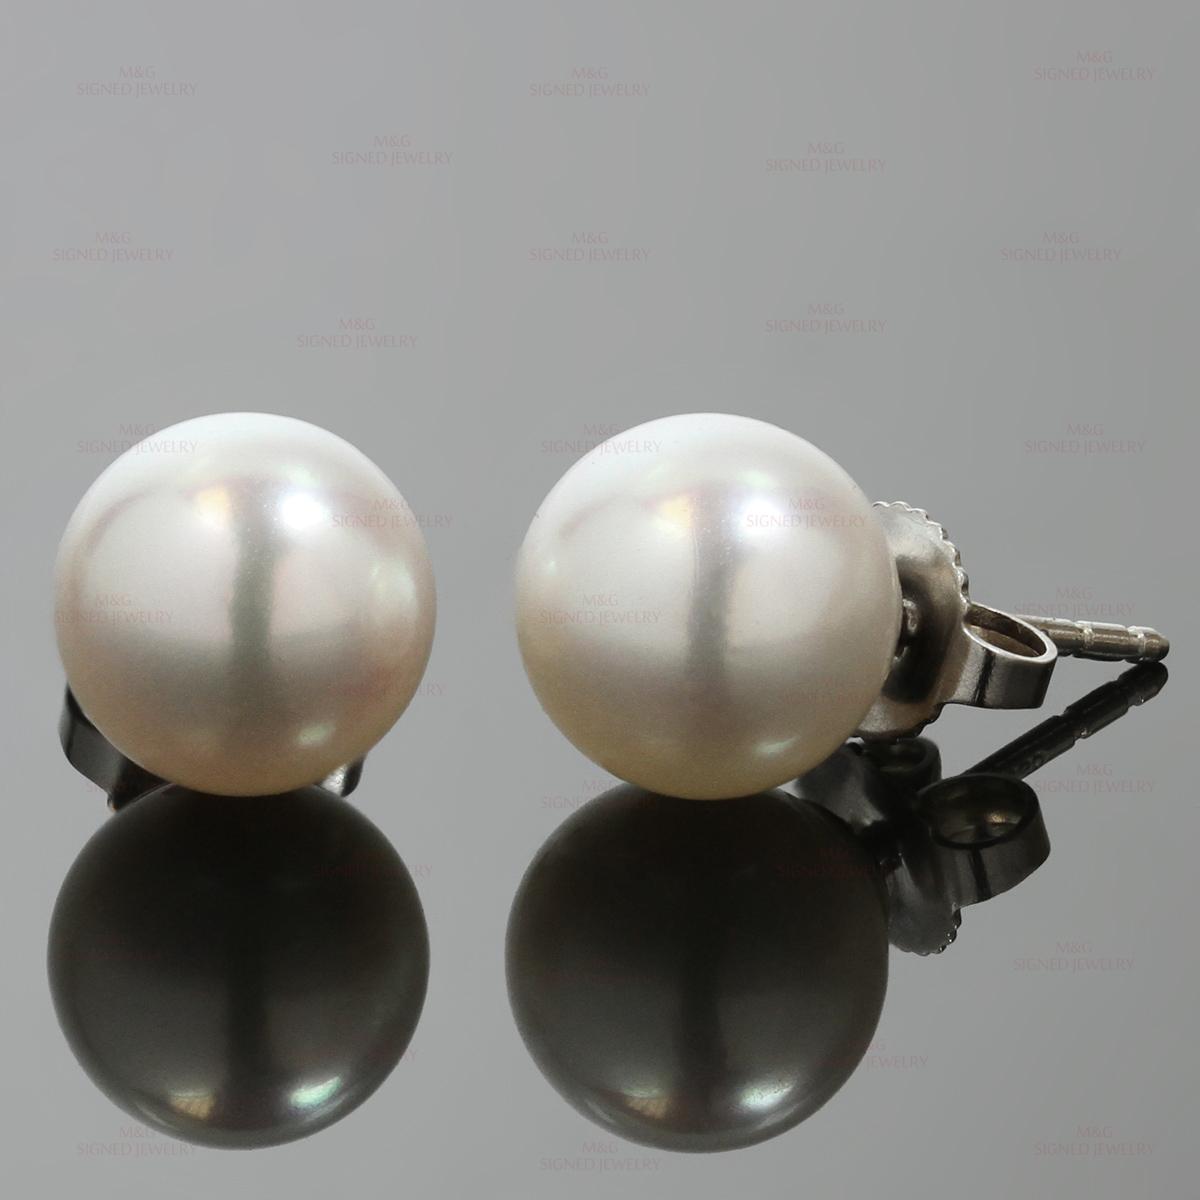 77e99586606734 TIFFANY & Co. Signature Akoya Cultured Pearl 18k White Gold Stud Earrings